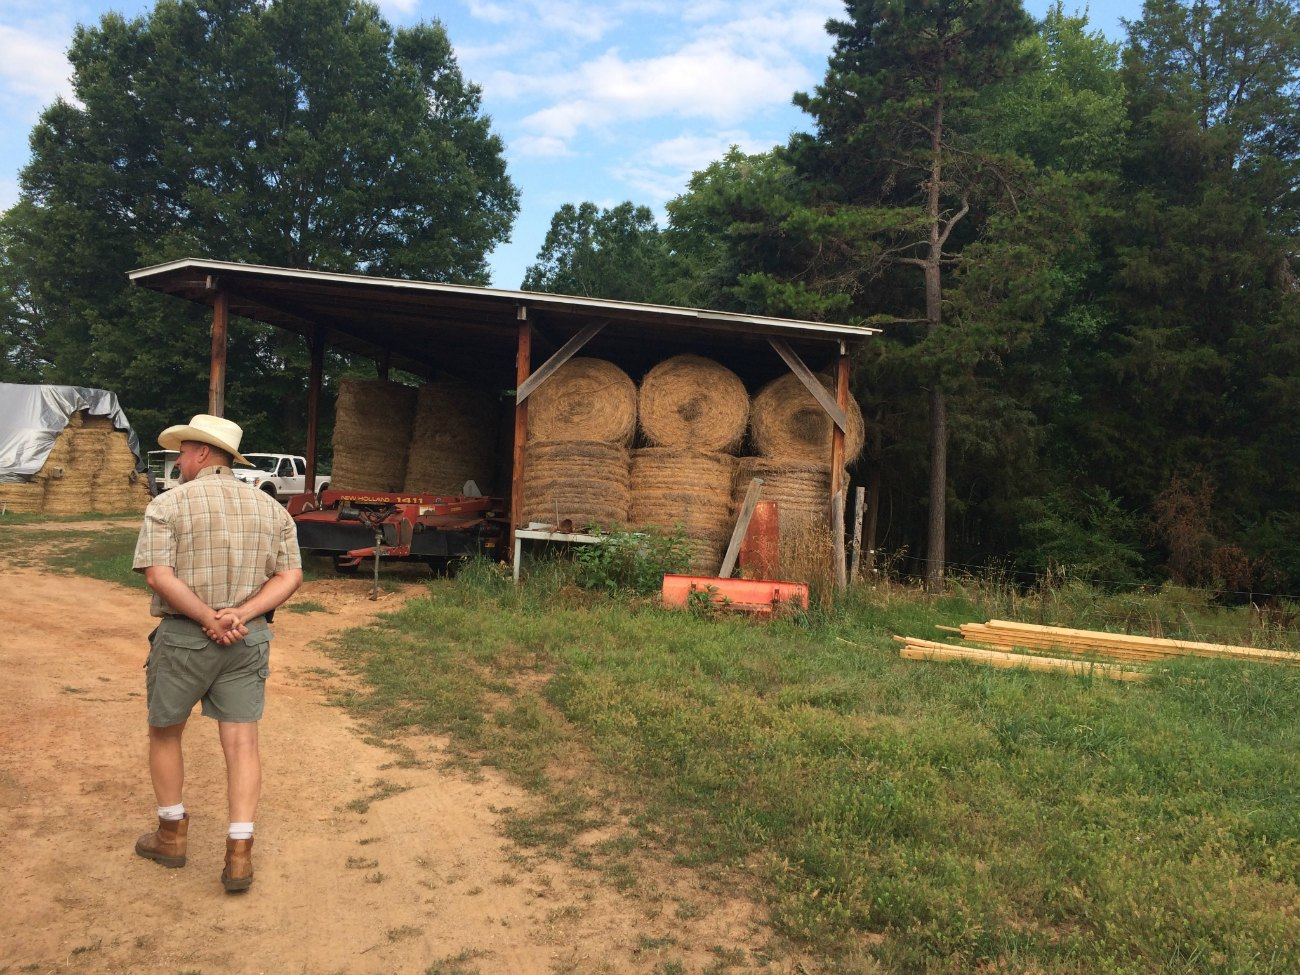 Do you care about local sustainability? Introducing the Carolina Jubilee farm celebration